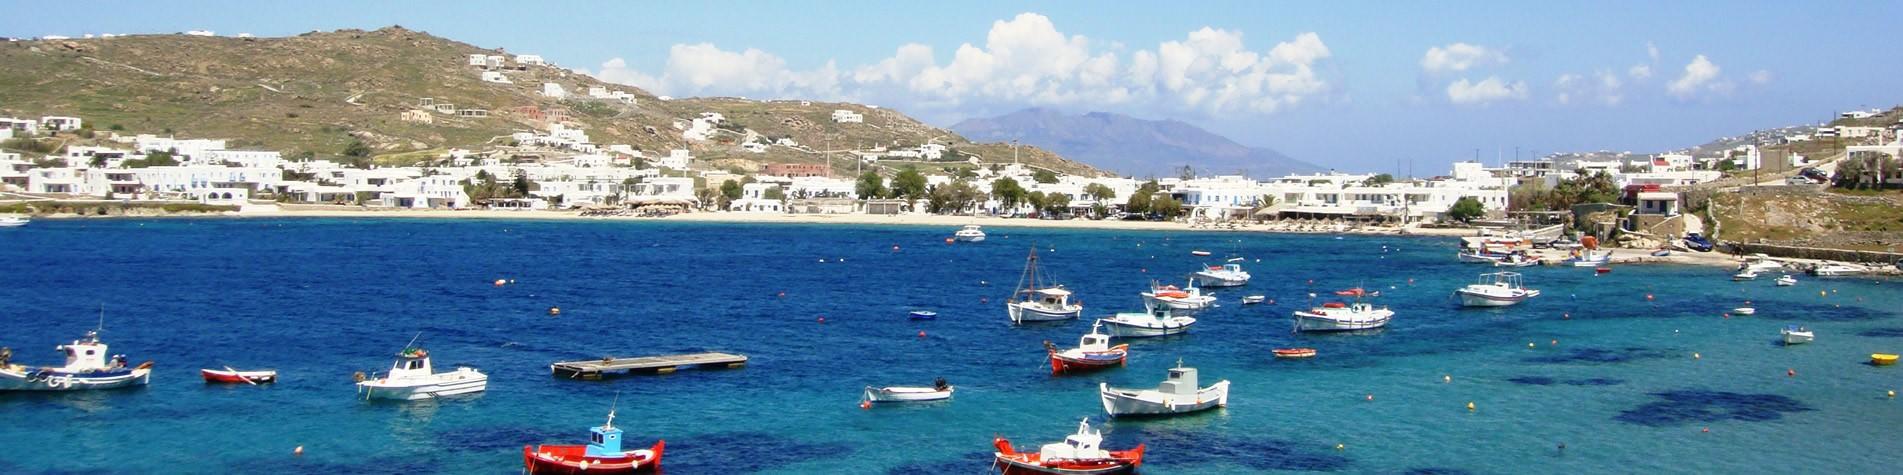 Mykonos Island Holidays with Cyplon Holidays